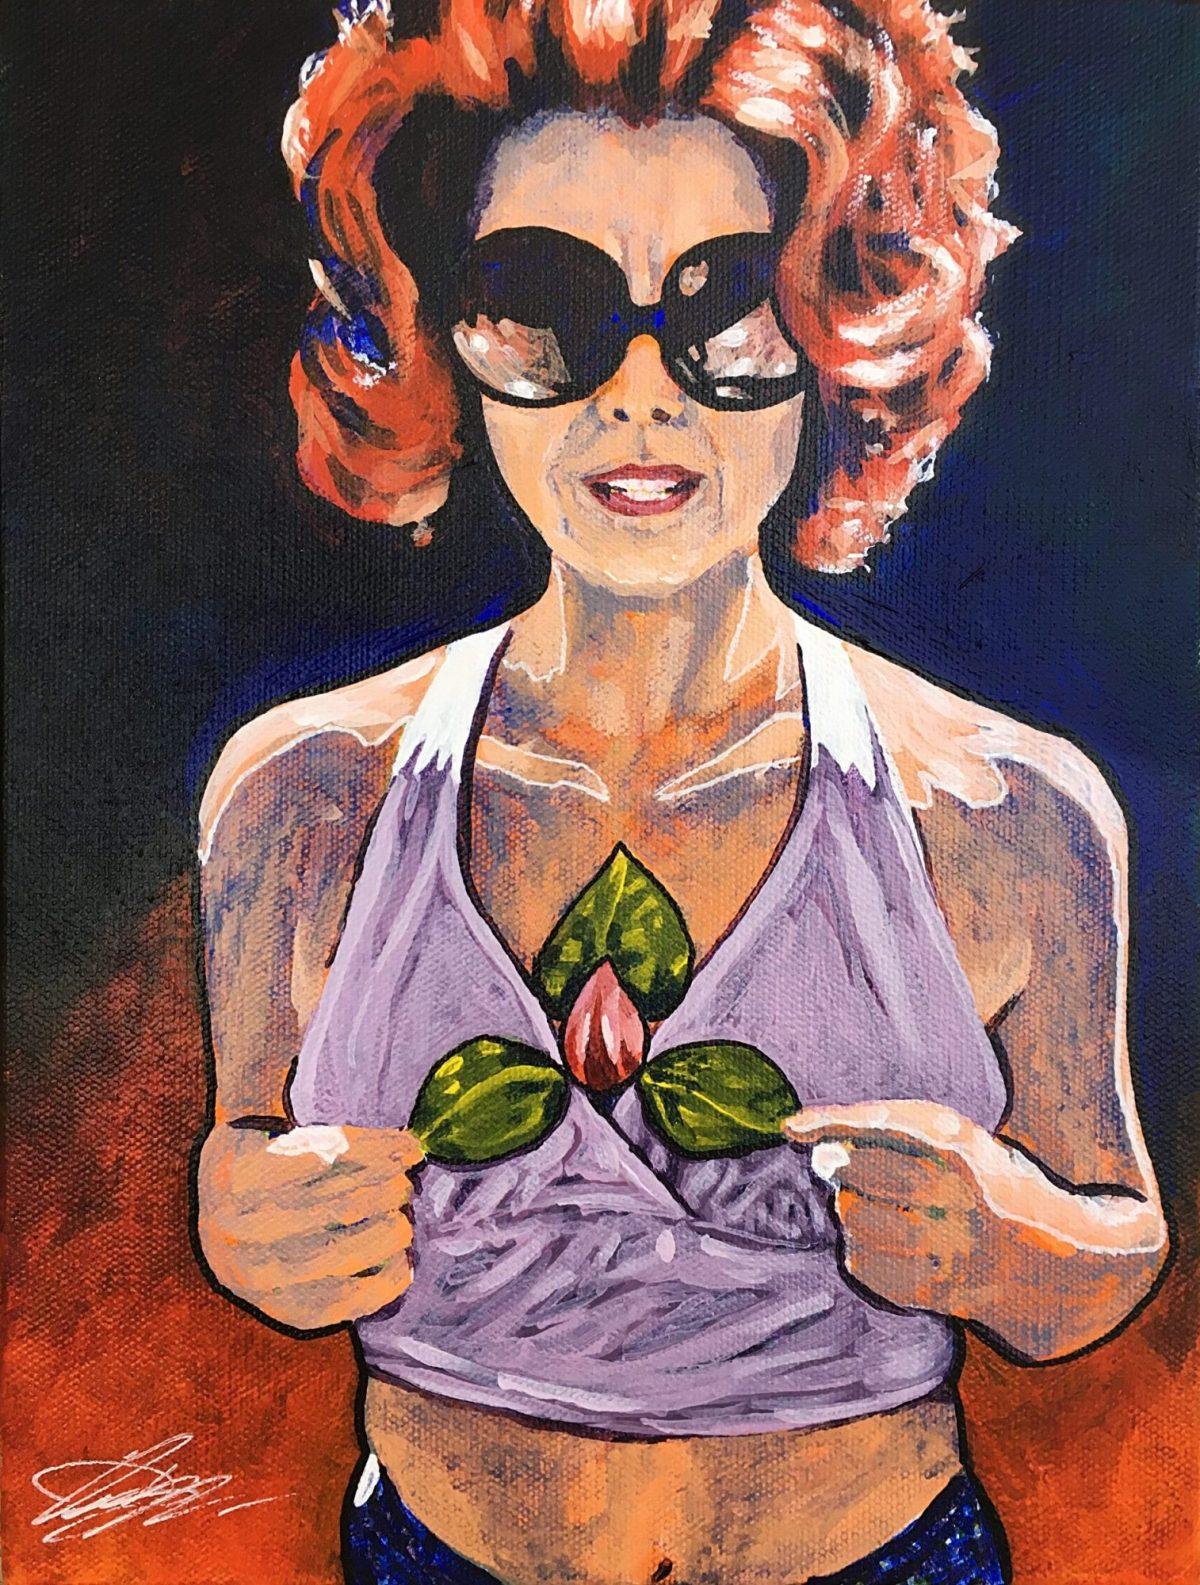 Owen York Art - Portrait of a Mother